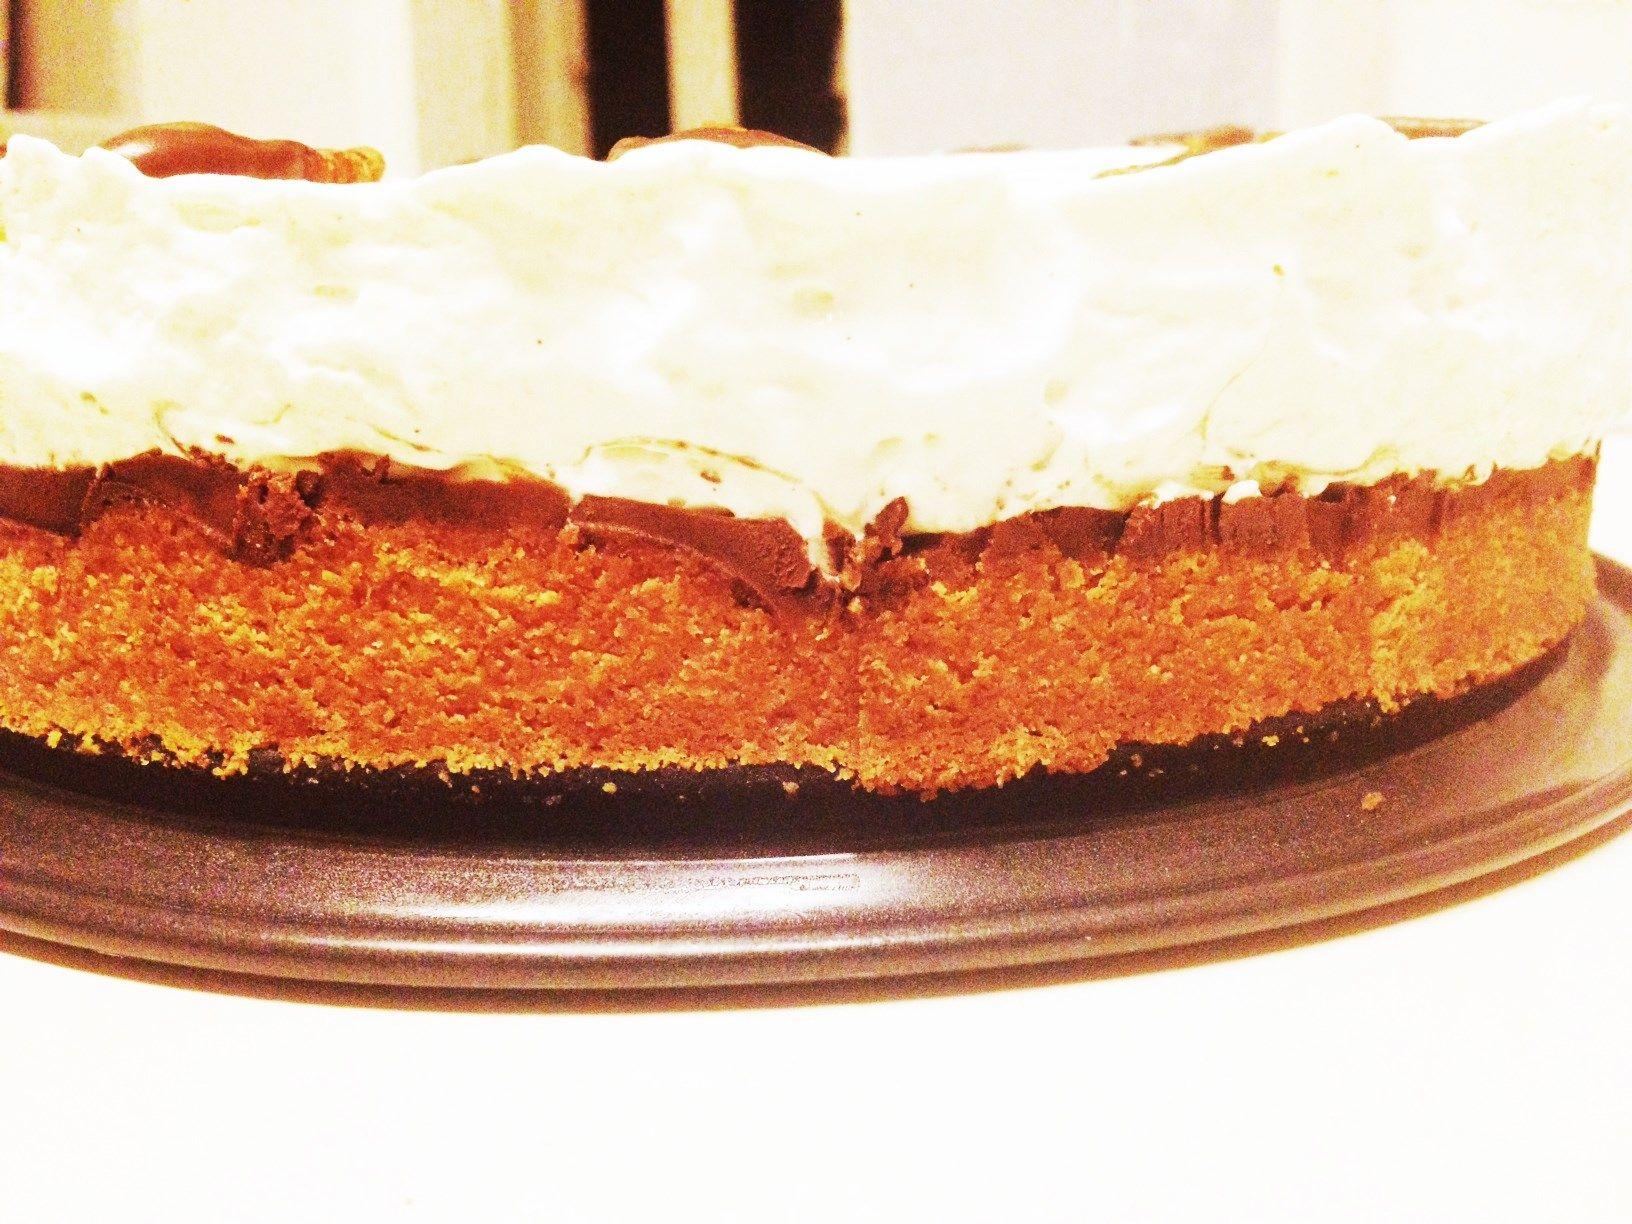 Delicious Low Sugar Cake Recipes: Delicious No-Bake Low Carb Cheesecake (With No Artificial